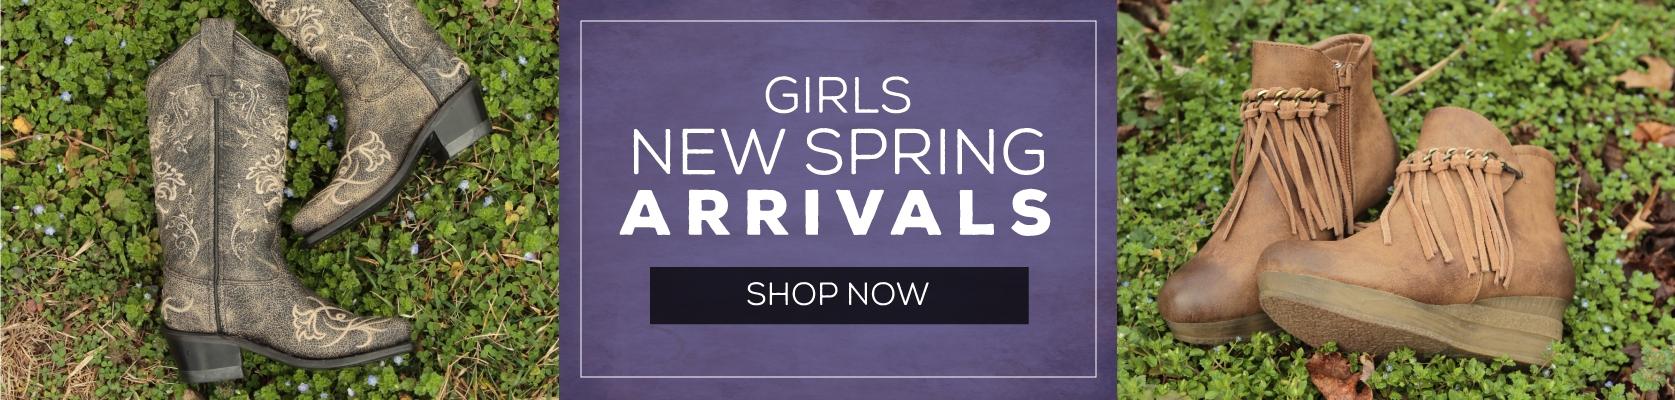 Girls New Arrivals